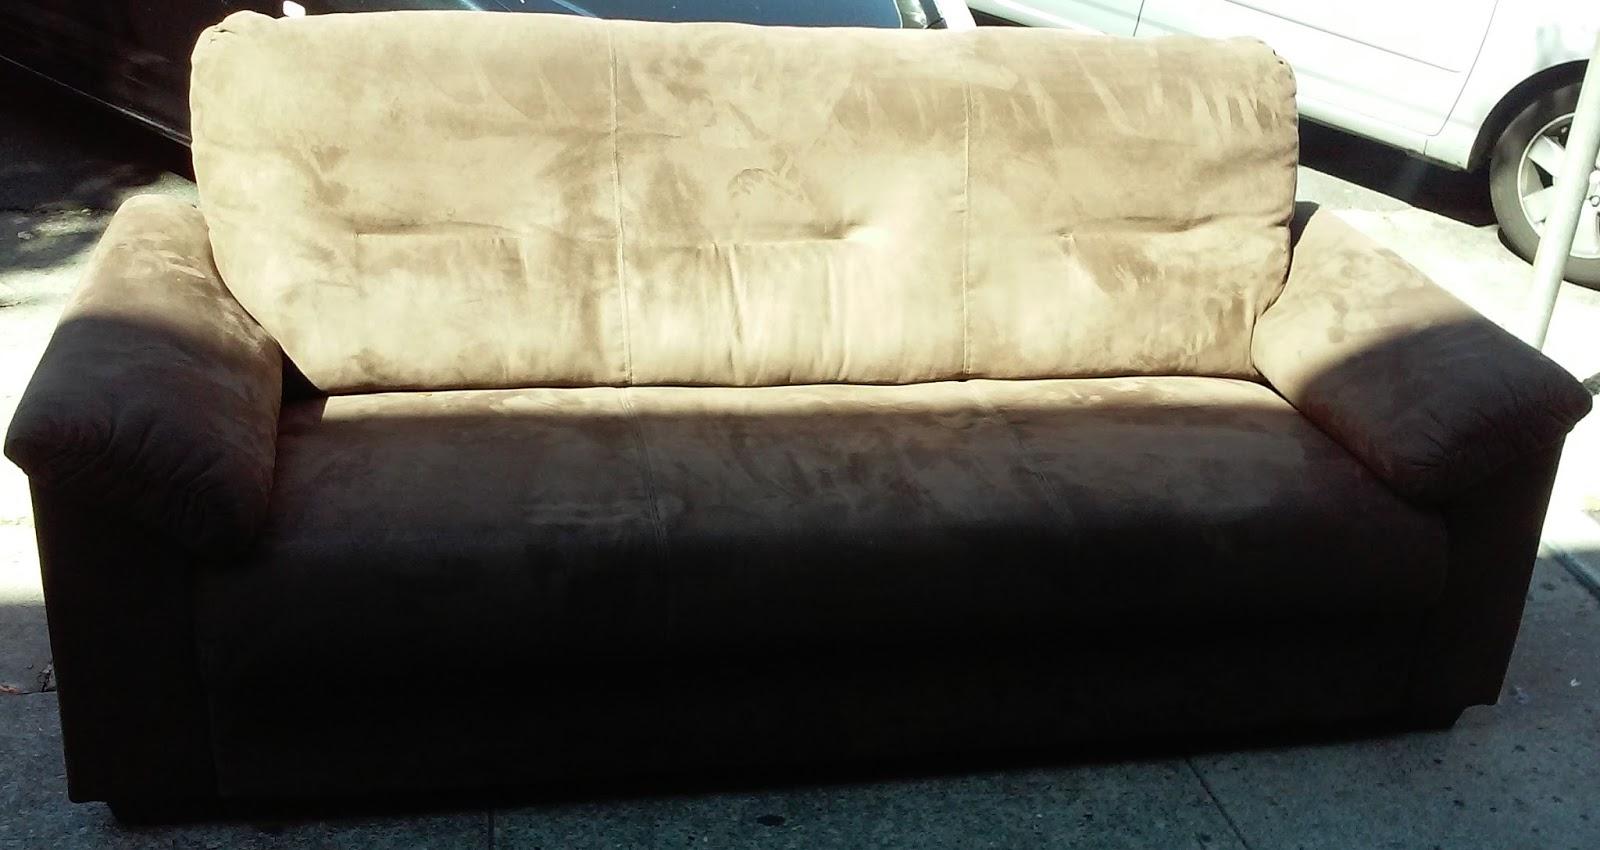 Uhuru Furniture Collectibles Sold Ikea Knislinge